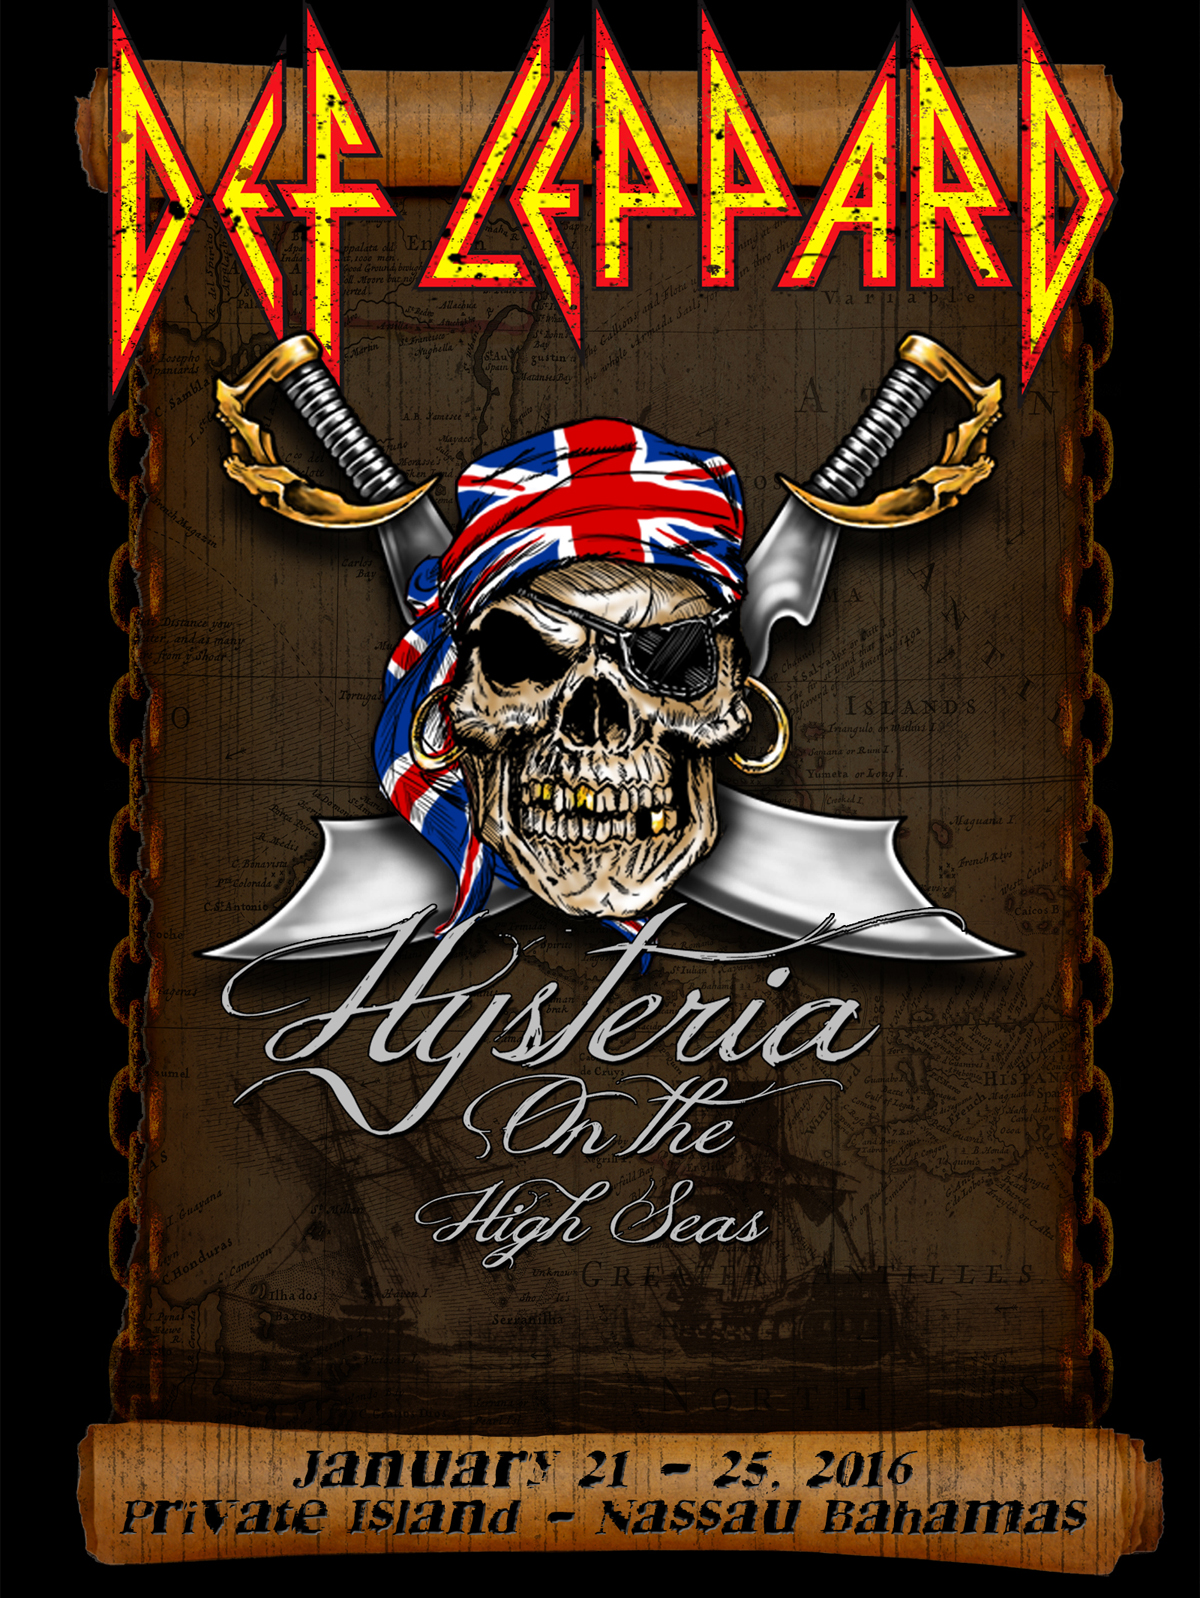 Def Leppard Announce Hysteria On The High Seas Cruise Gigwise